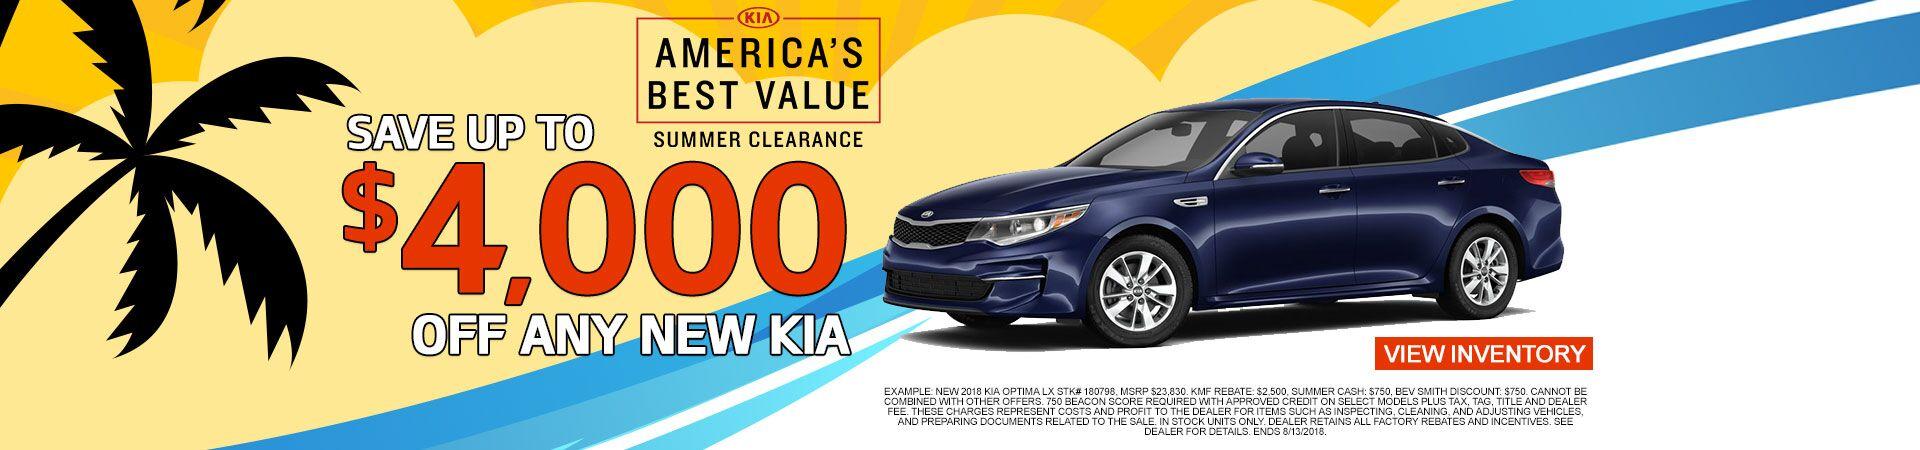 ... Kia Dealership Fort Pierce Fl Used Cars Bev Smith Kia Of Fort ...